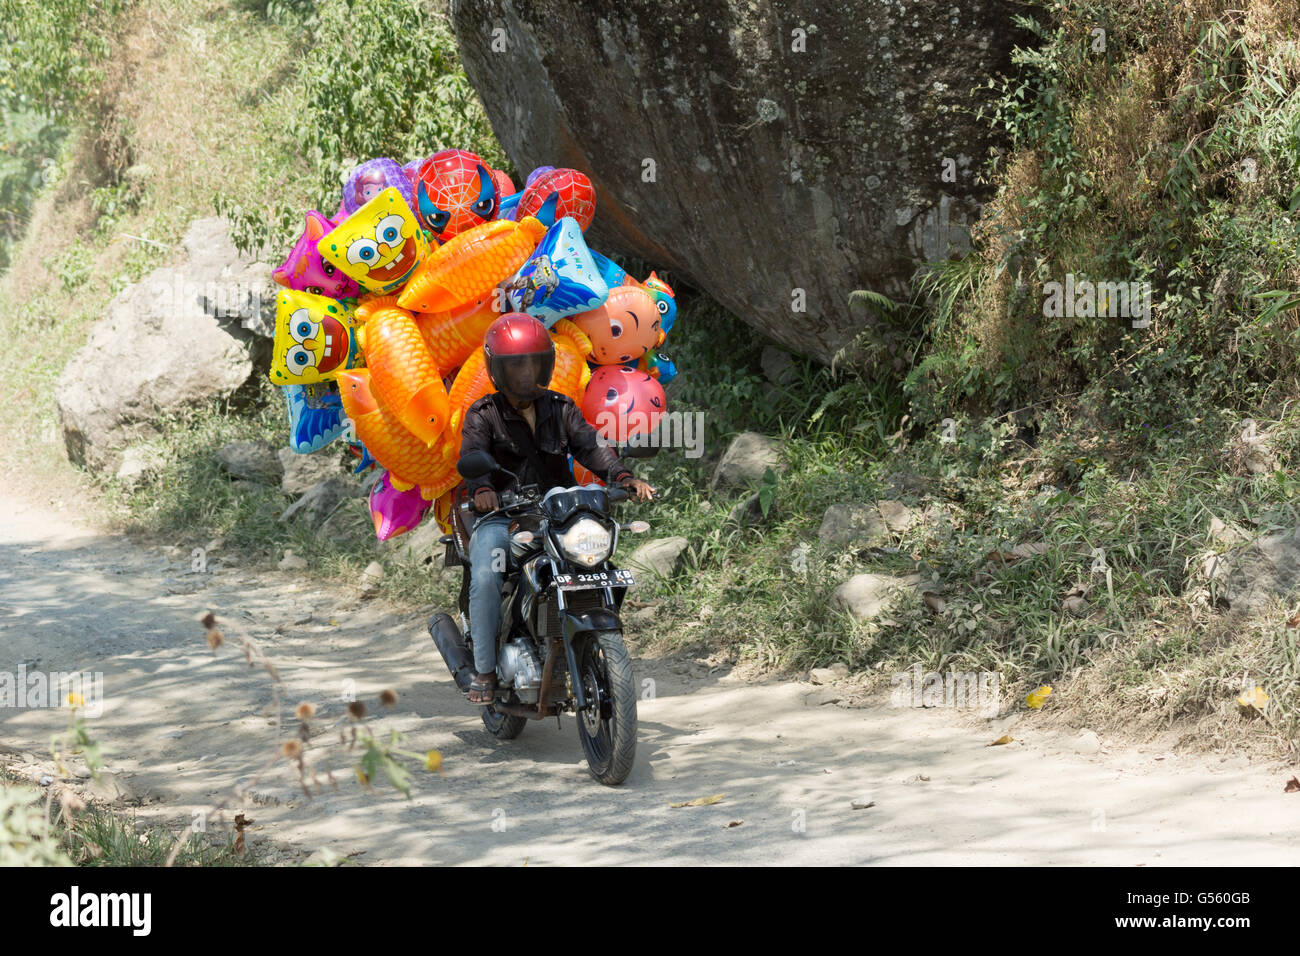 Indonesia, Sulawesi Selatan, Toraja Utara, balloon transport - Stock Image